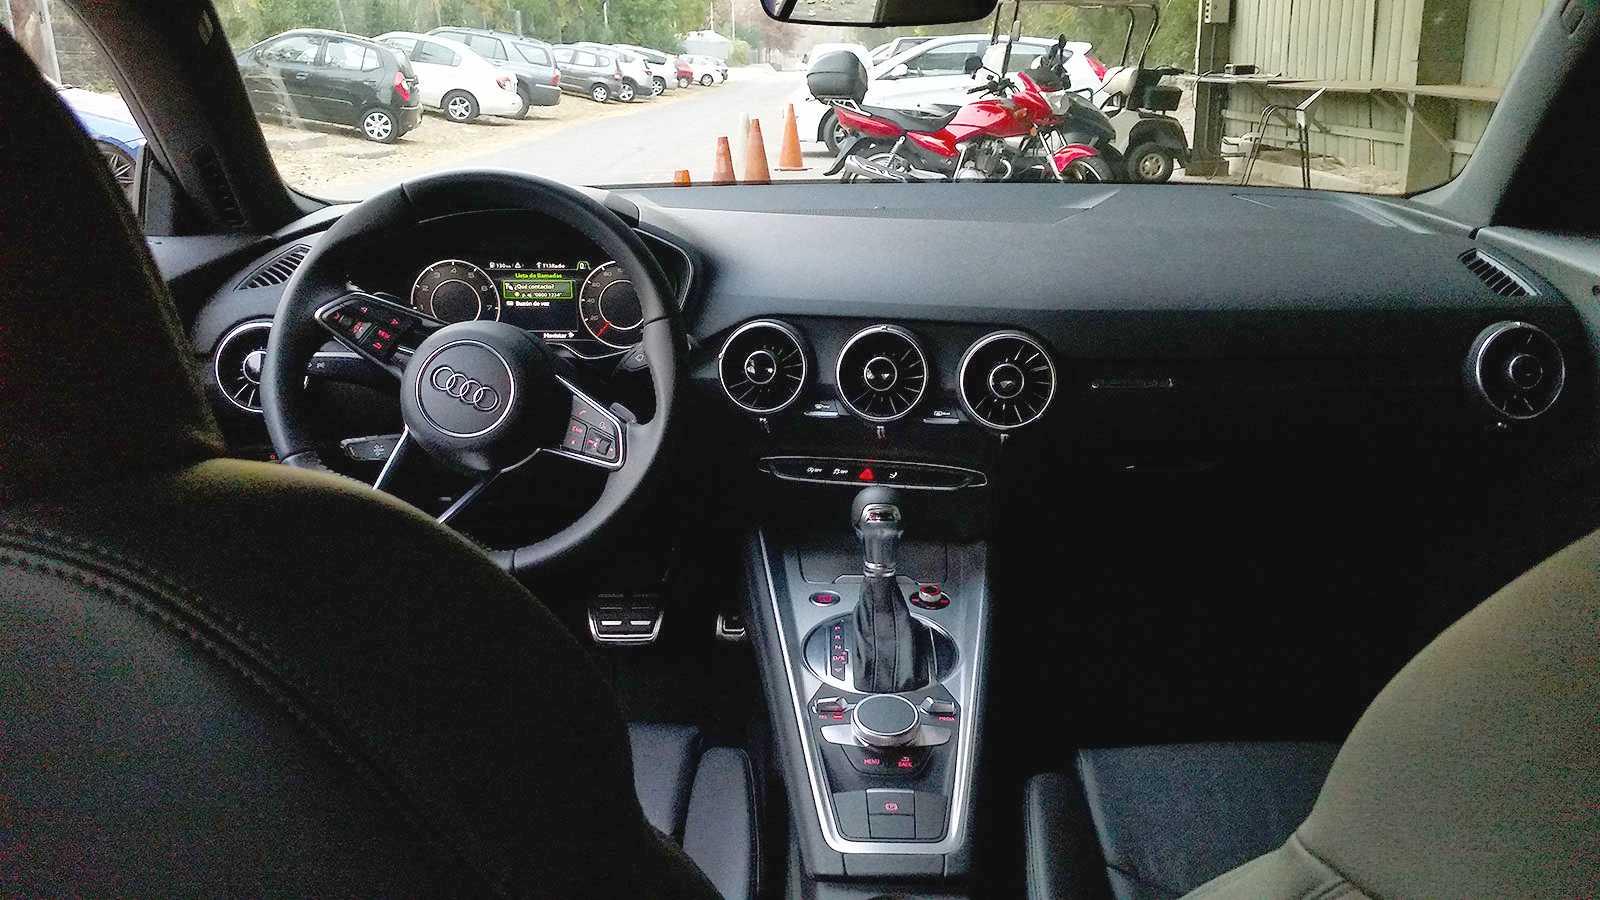 Audi TT 2.0 TFSi 230 CV Stronic Coupé 2015 Test Drive Rutamotor (6)